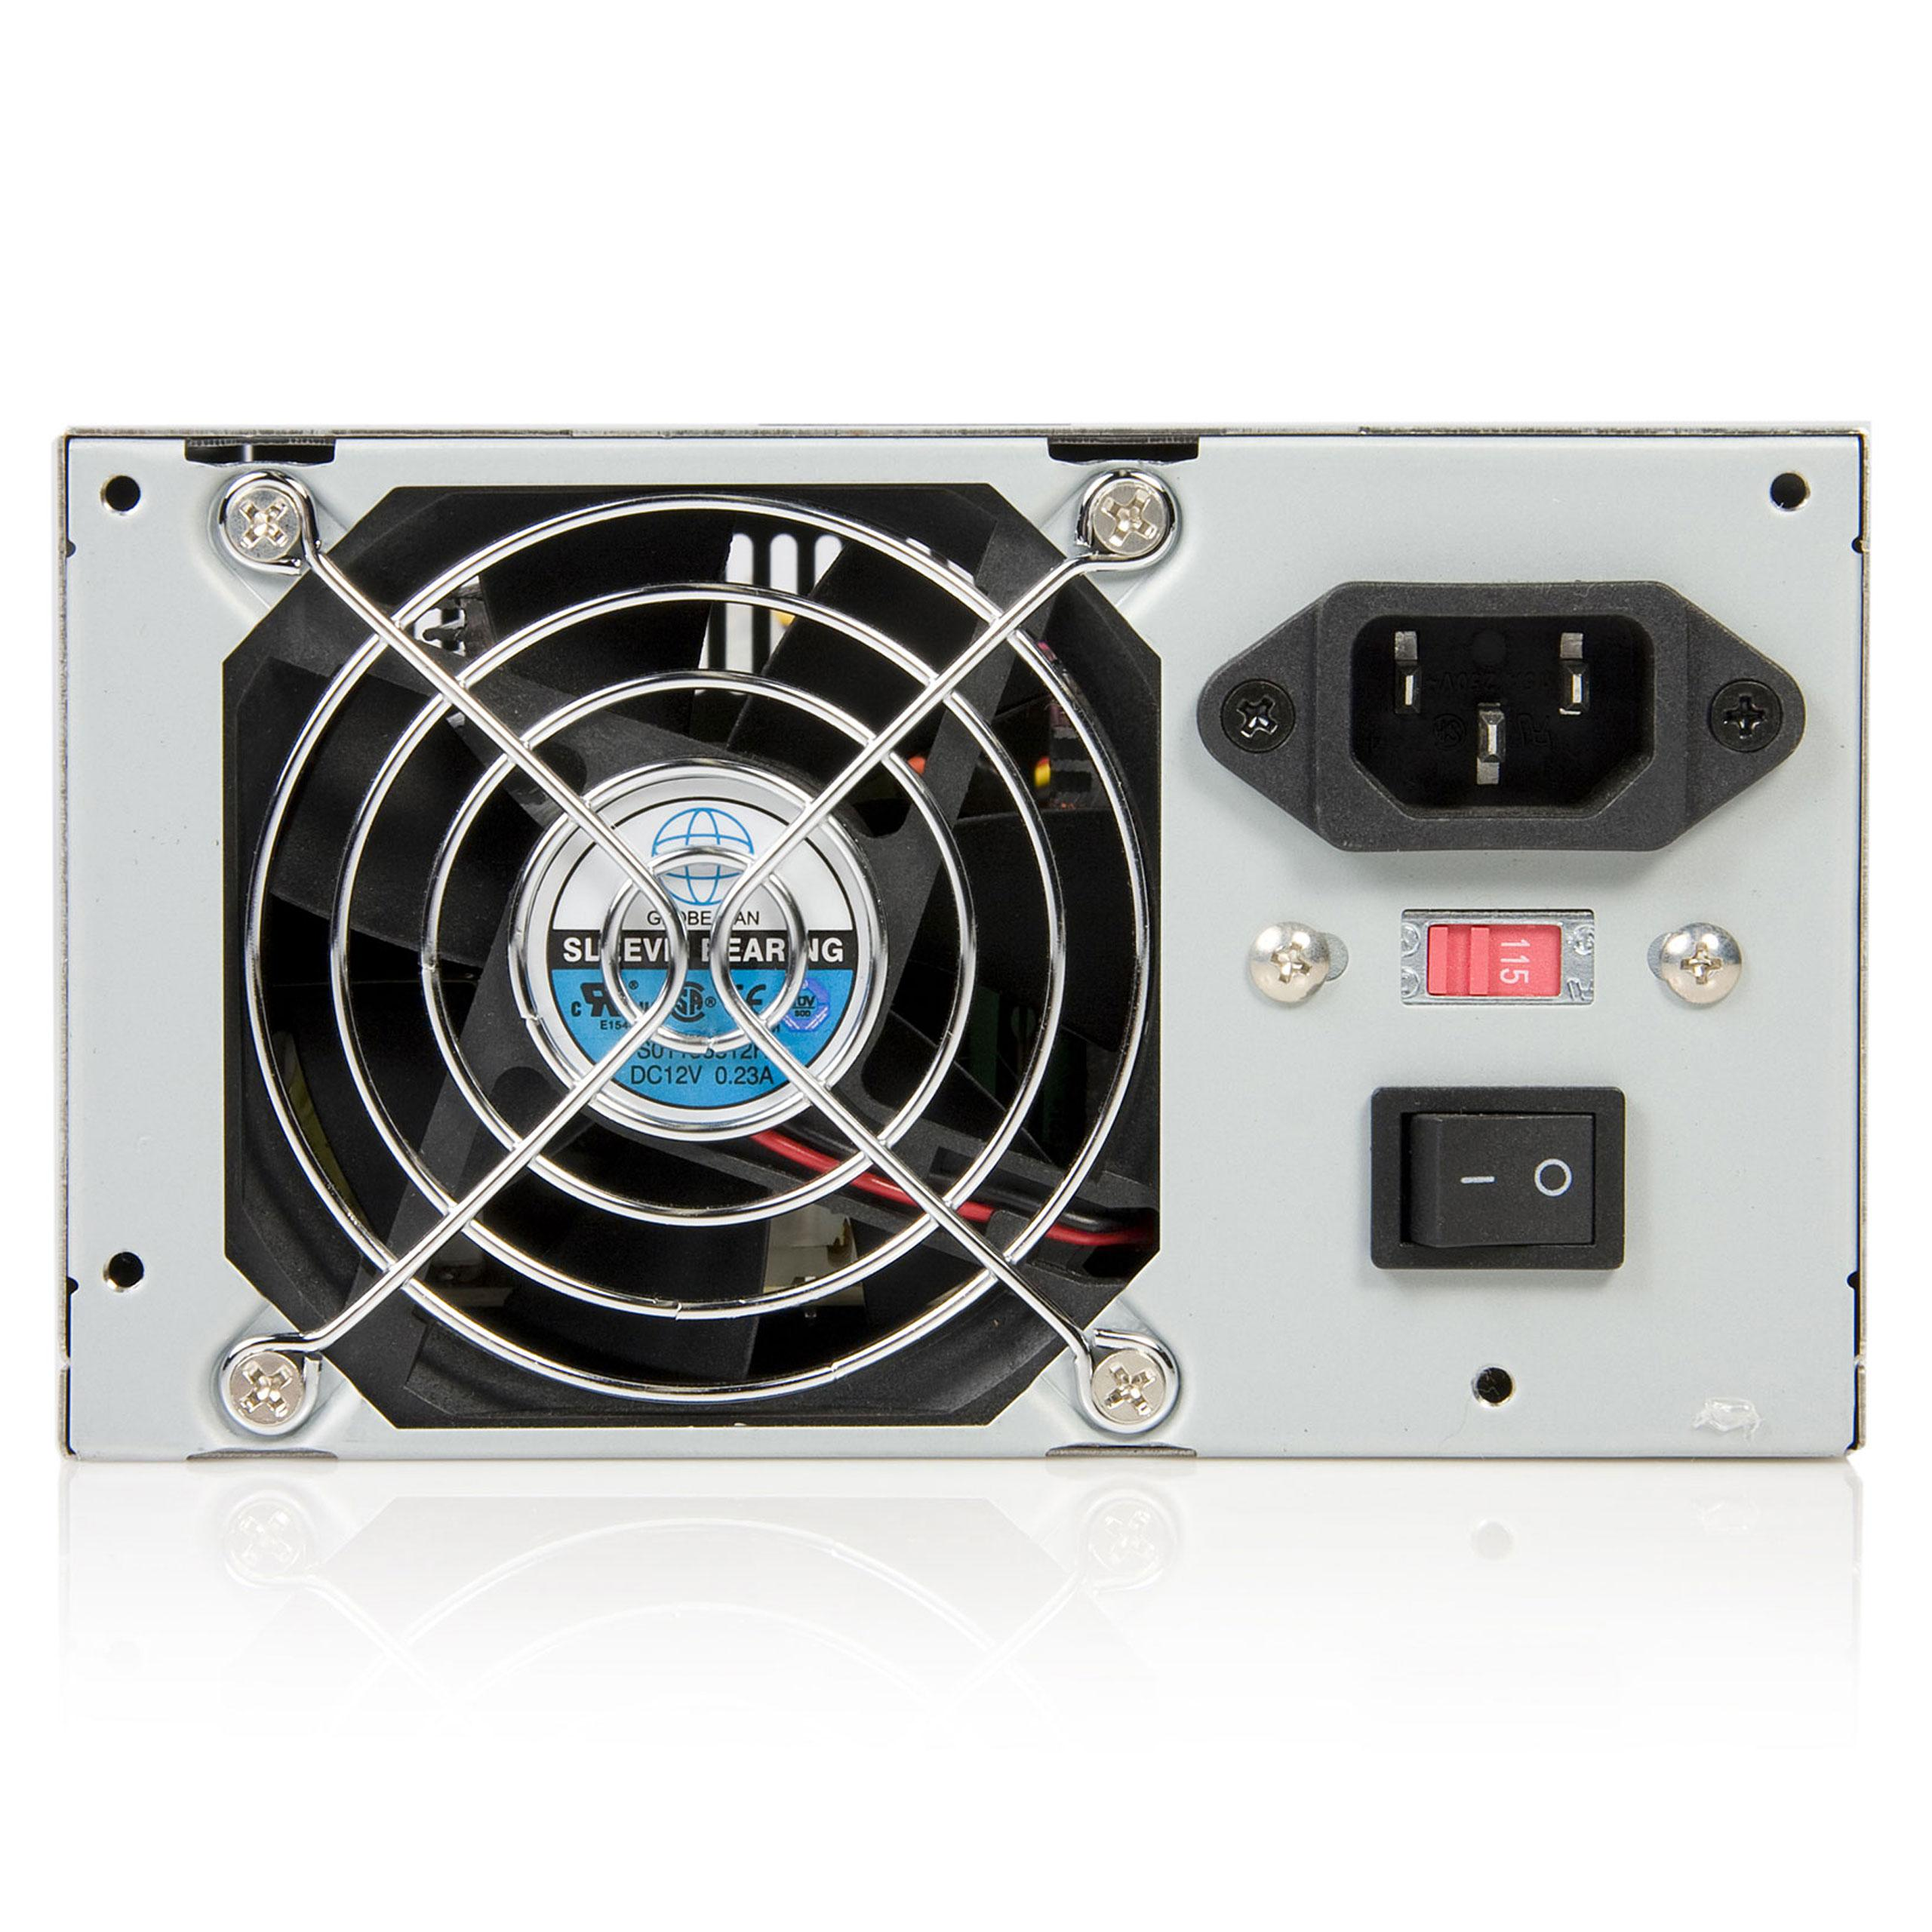 300 watt atx replacement computer pc power supp 1339 0 lapson mexico. Black Bedroom Furniture Sets. Home Design Ideas